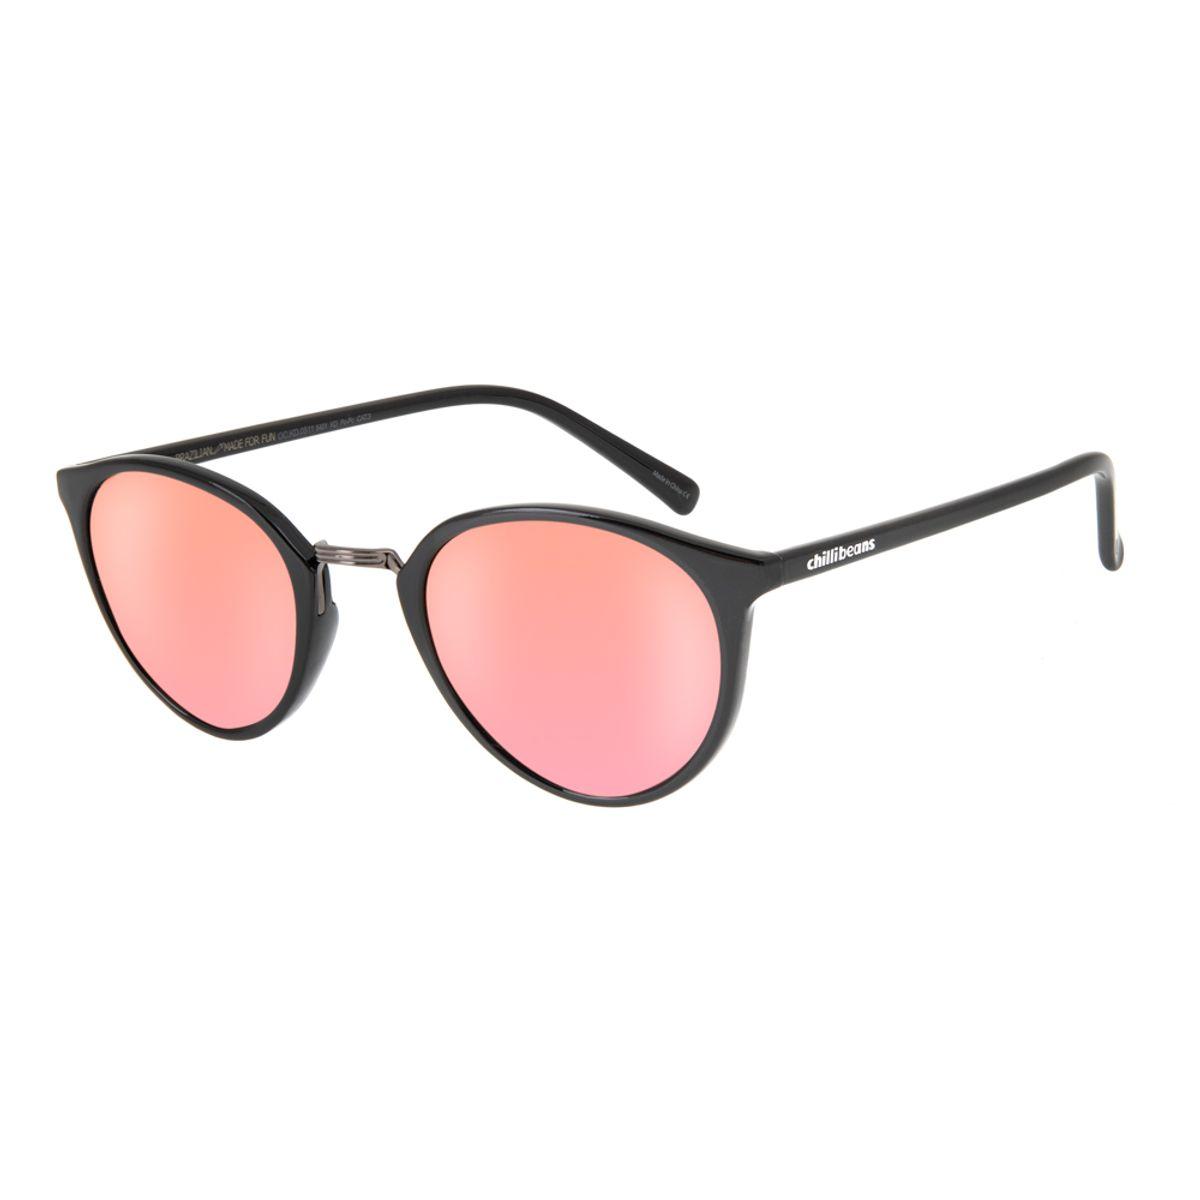 b4351c804 Óculos de Sol Chilli Beans Infantil Rosa Espelhado 0511 - Chilli Beans